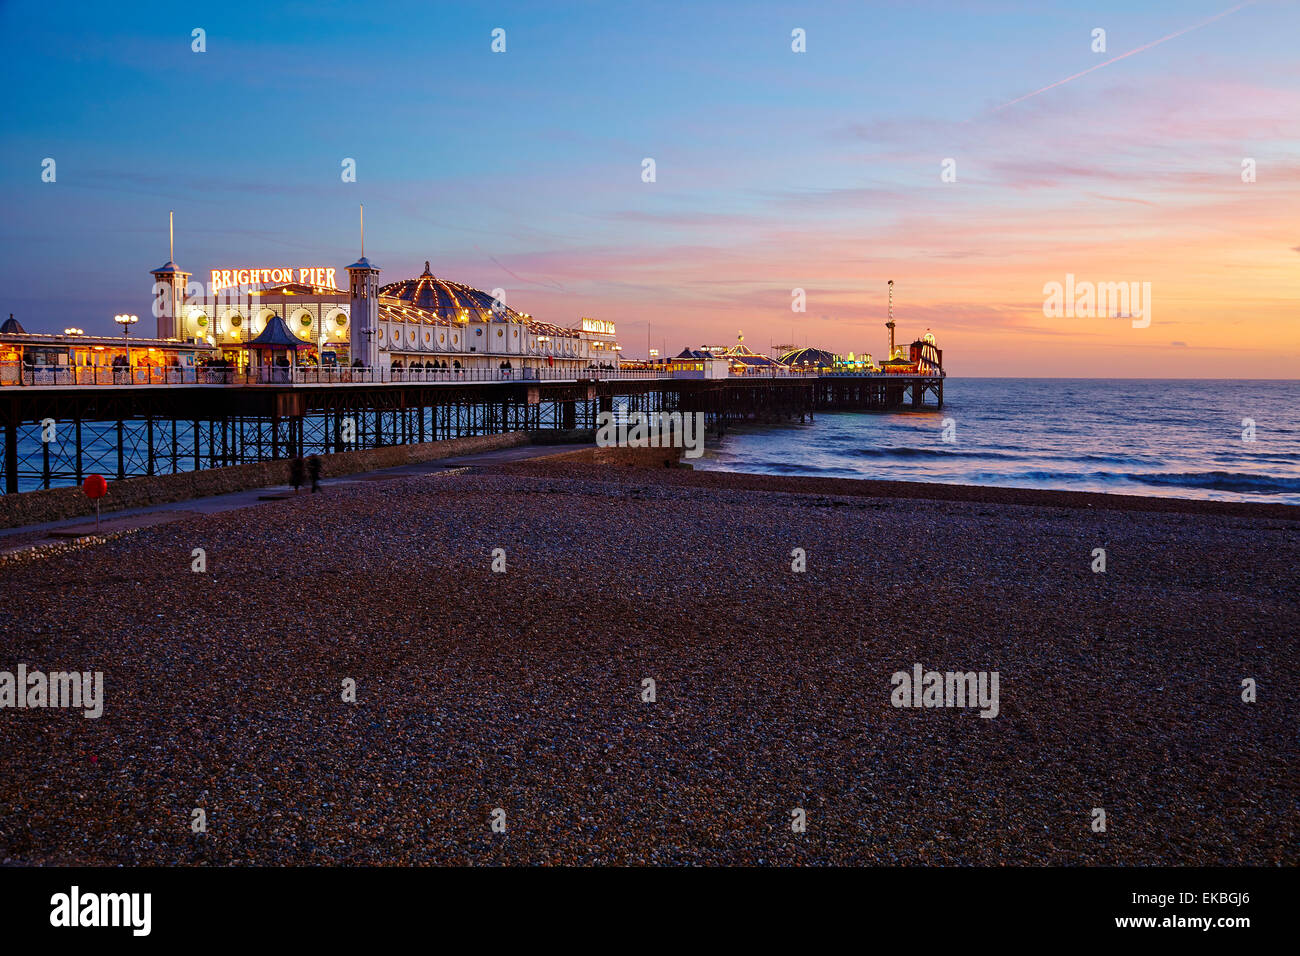 Brighton Pier, Brighton, Sussex, Inglaterra, Reino Unido, Europa Imagen De Stock